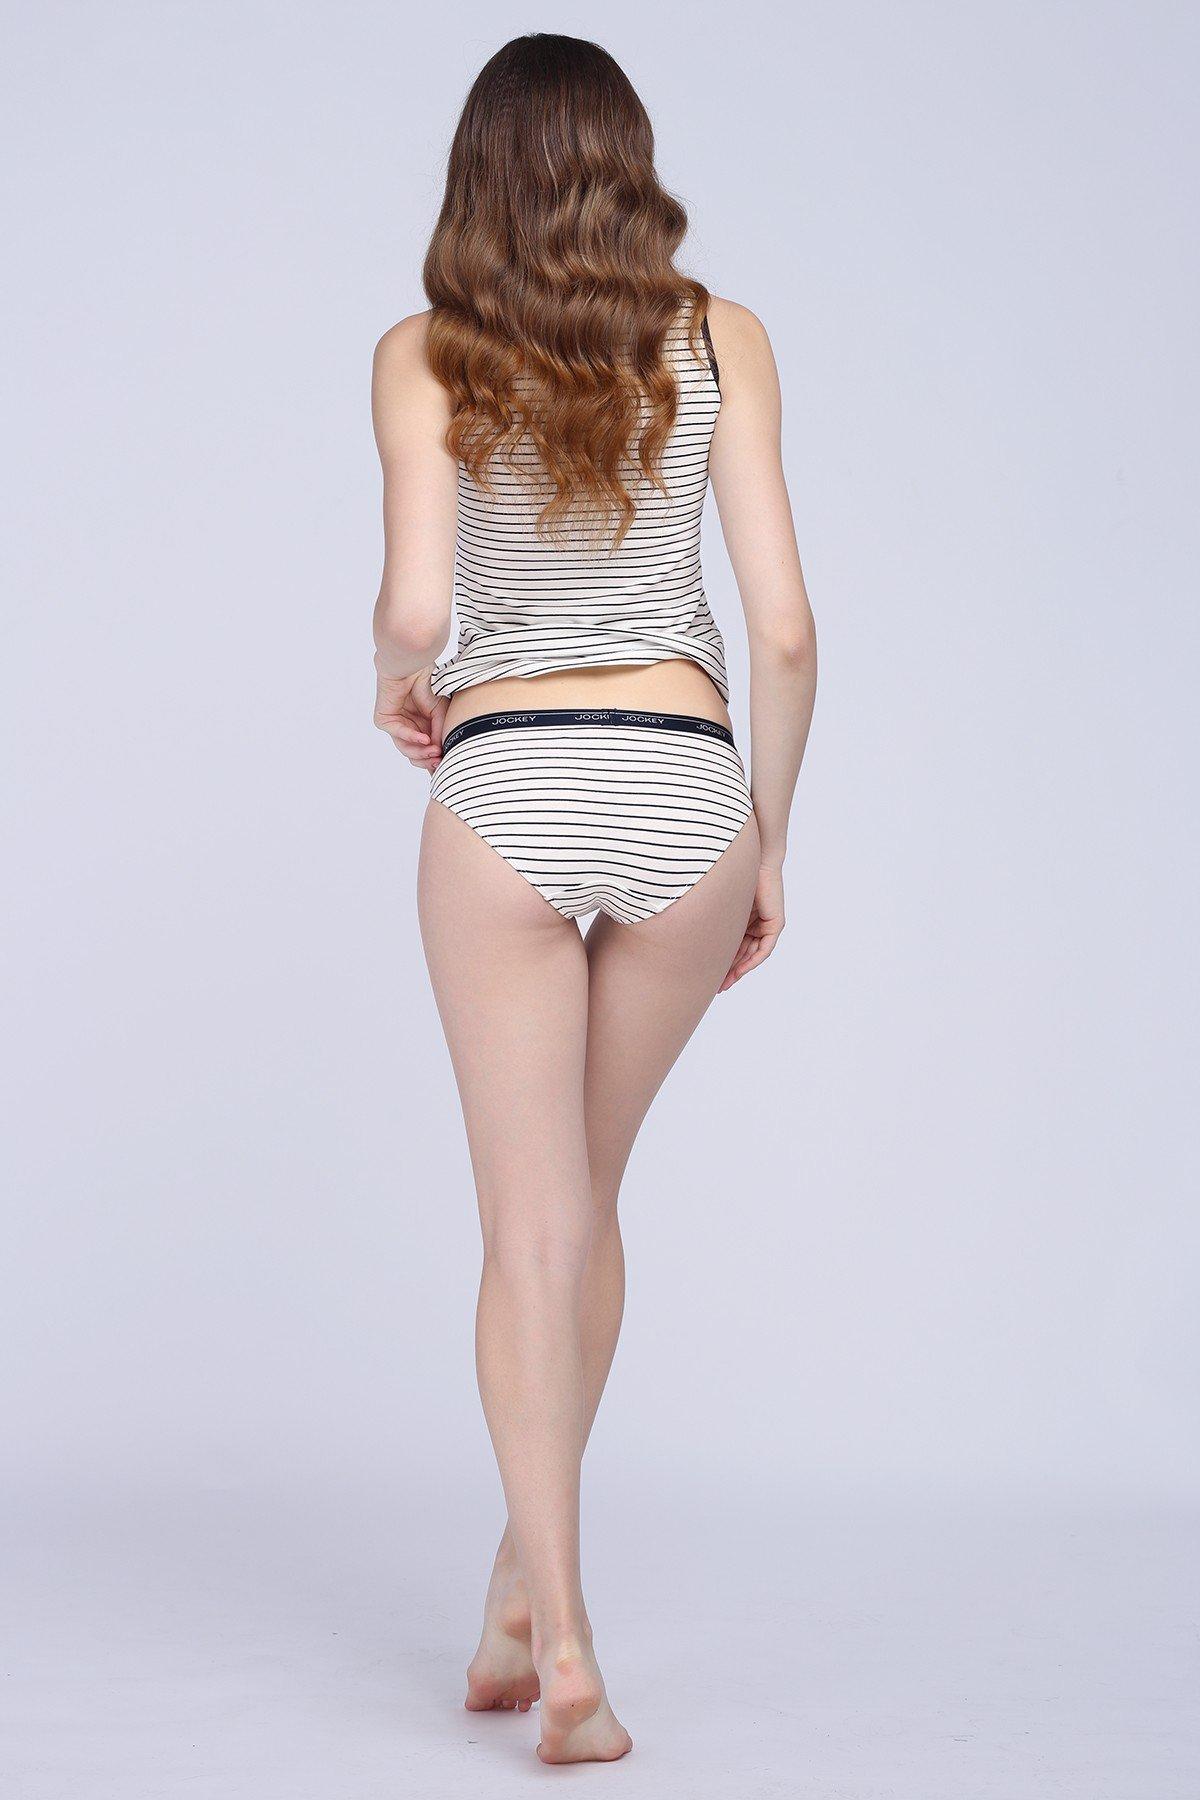 Quần lót bikini nữ Jockey Cruiser